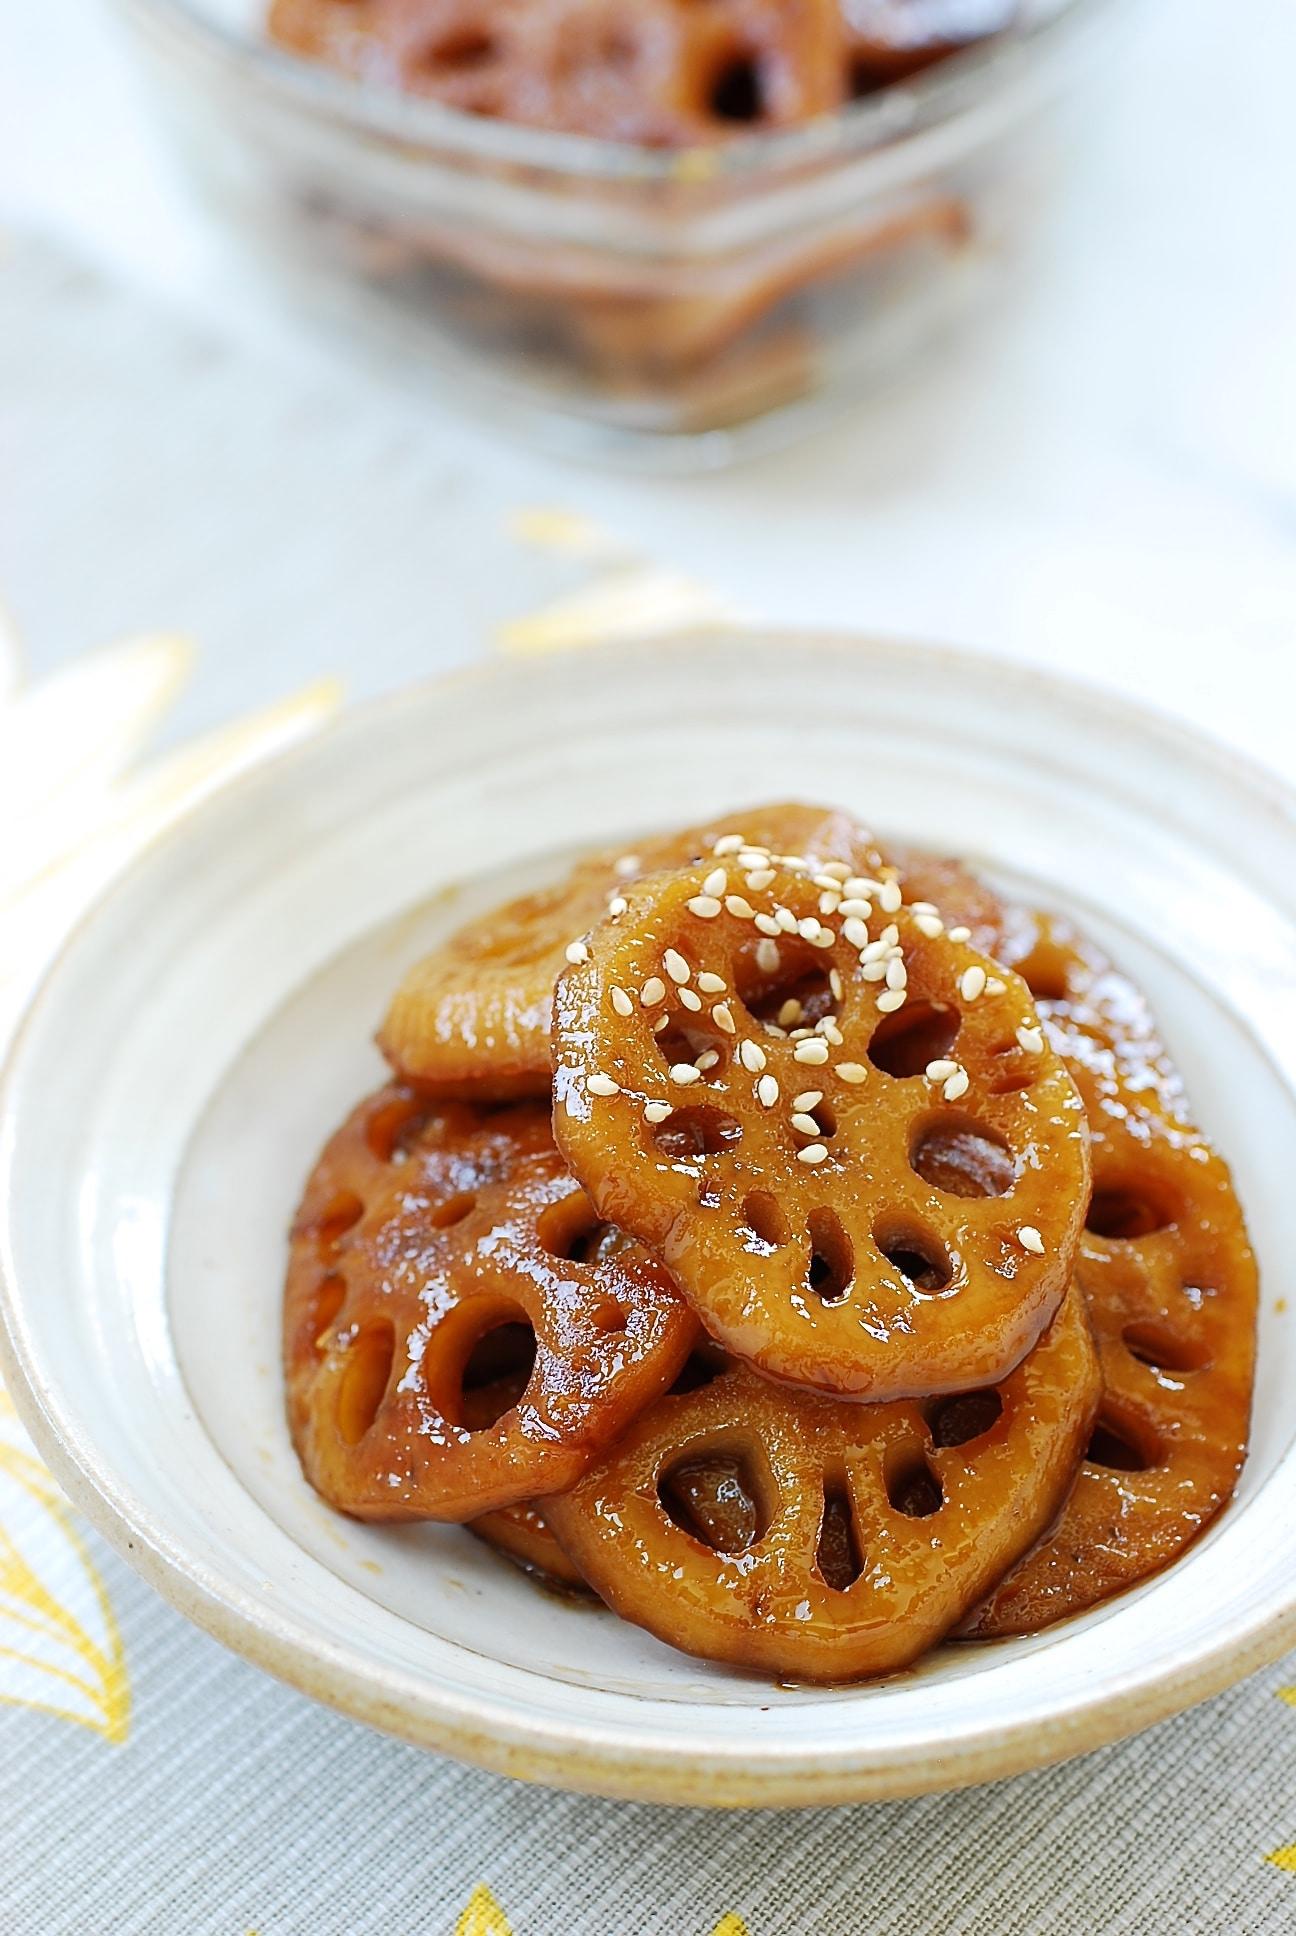 DSC 1901 2 - Yeongeun jorim (Sweet Soy Braised Lotus Roots)